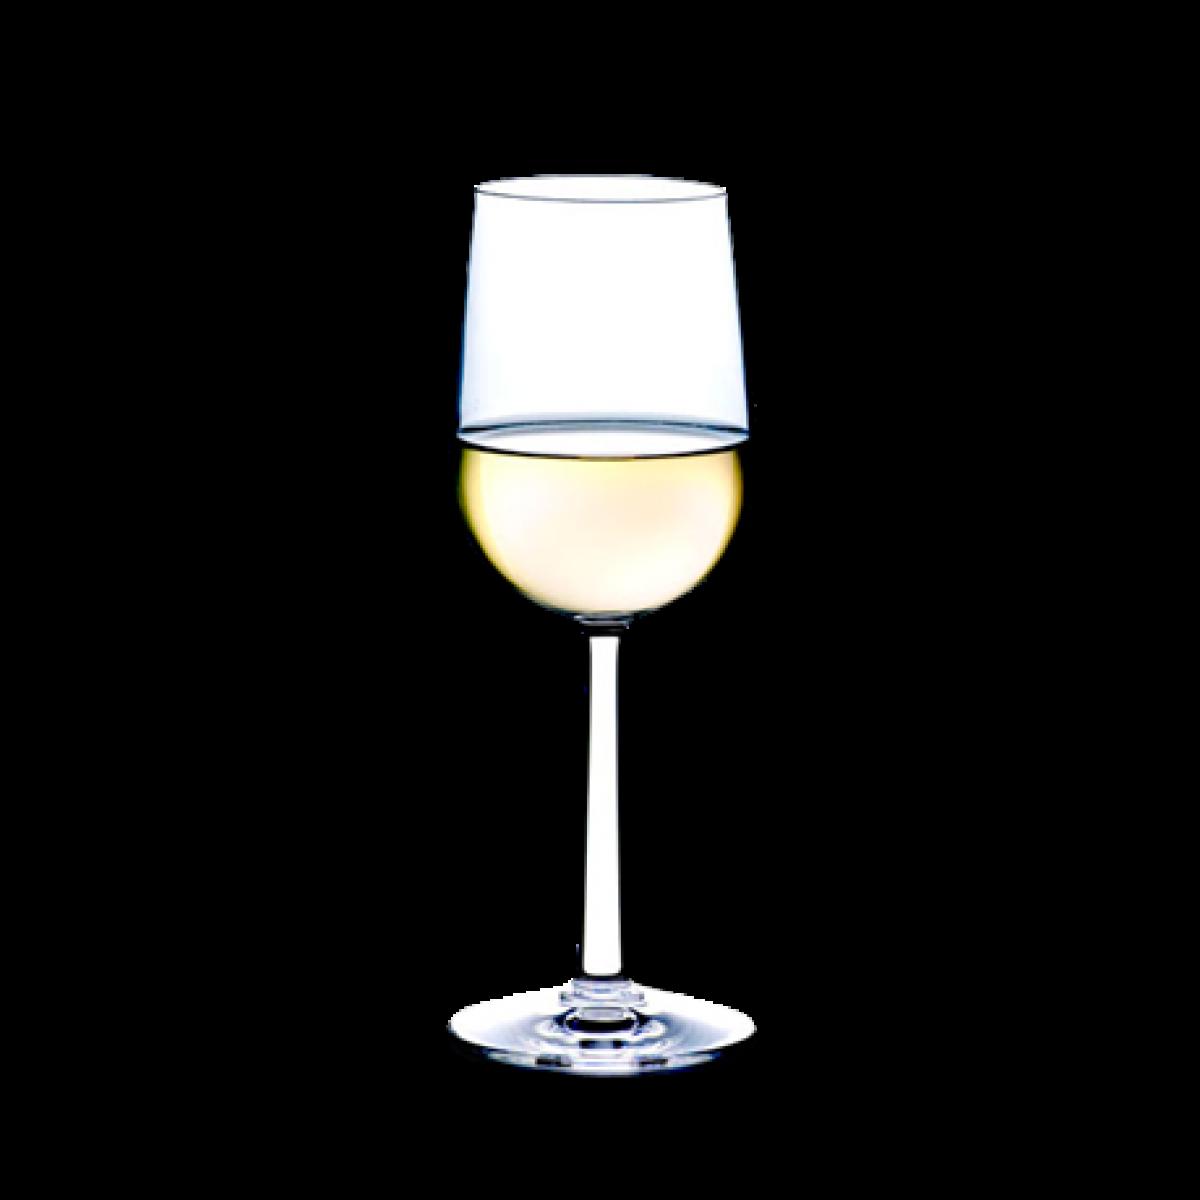 ROSENDAHL Grand Cru hvidvin bordeaux 32 cl 2 stk.